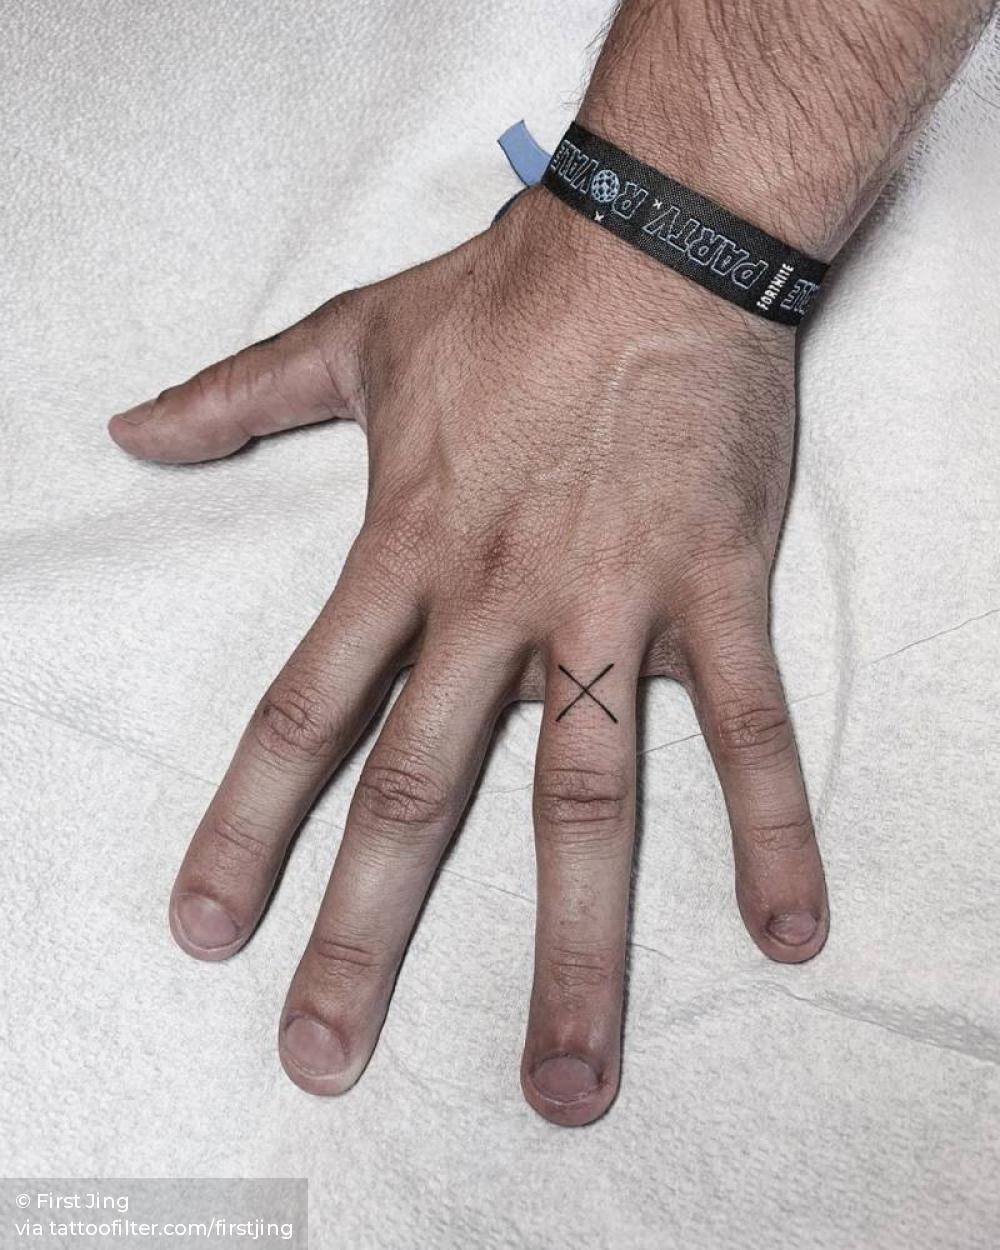 X Letter Tattoo On The Left Ring Finger Tattoo Lettering Ring